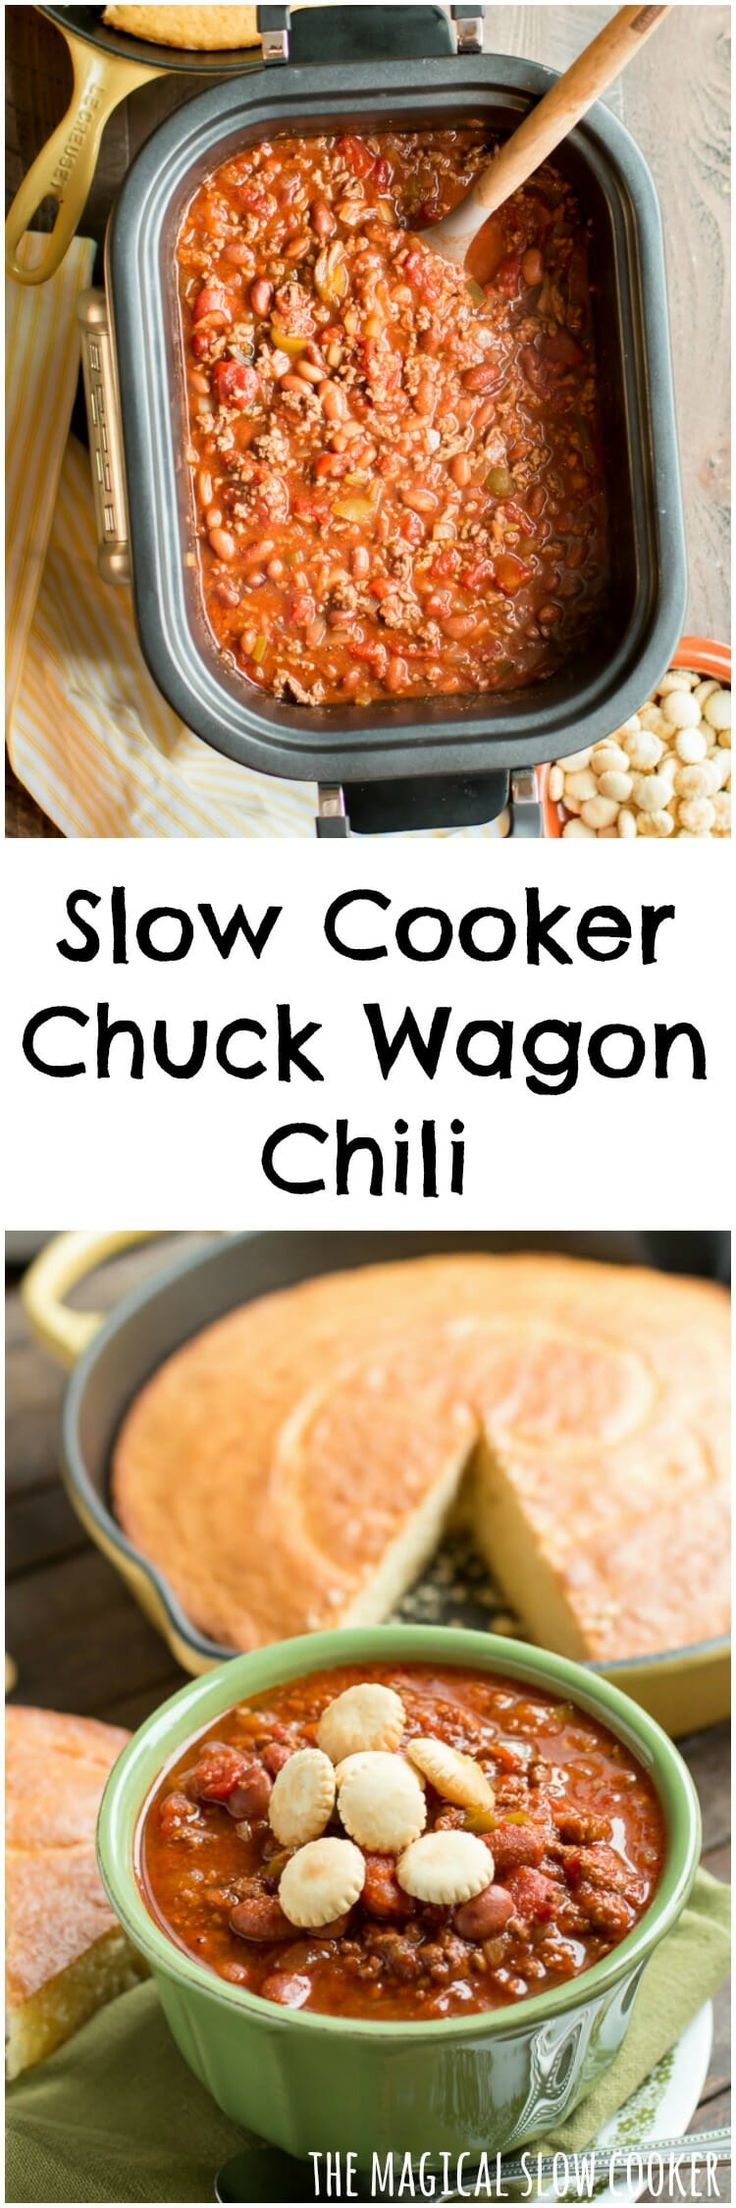 Slow Cooker Chuck Wagon Chili